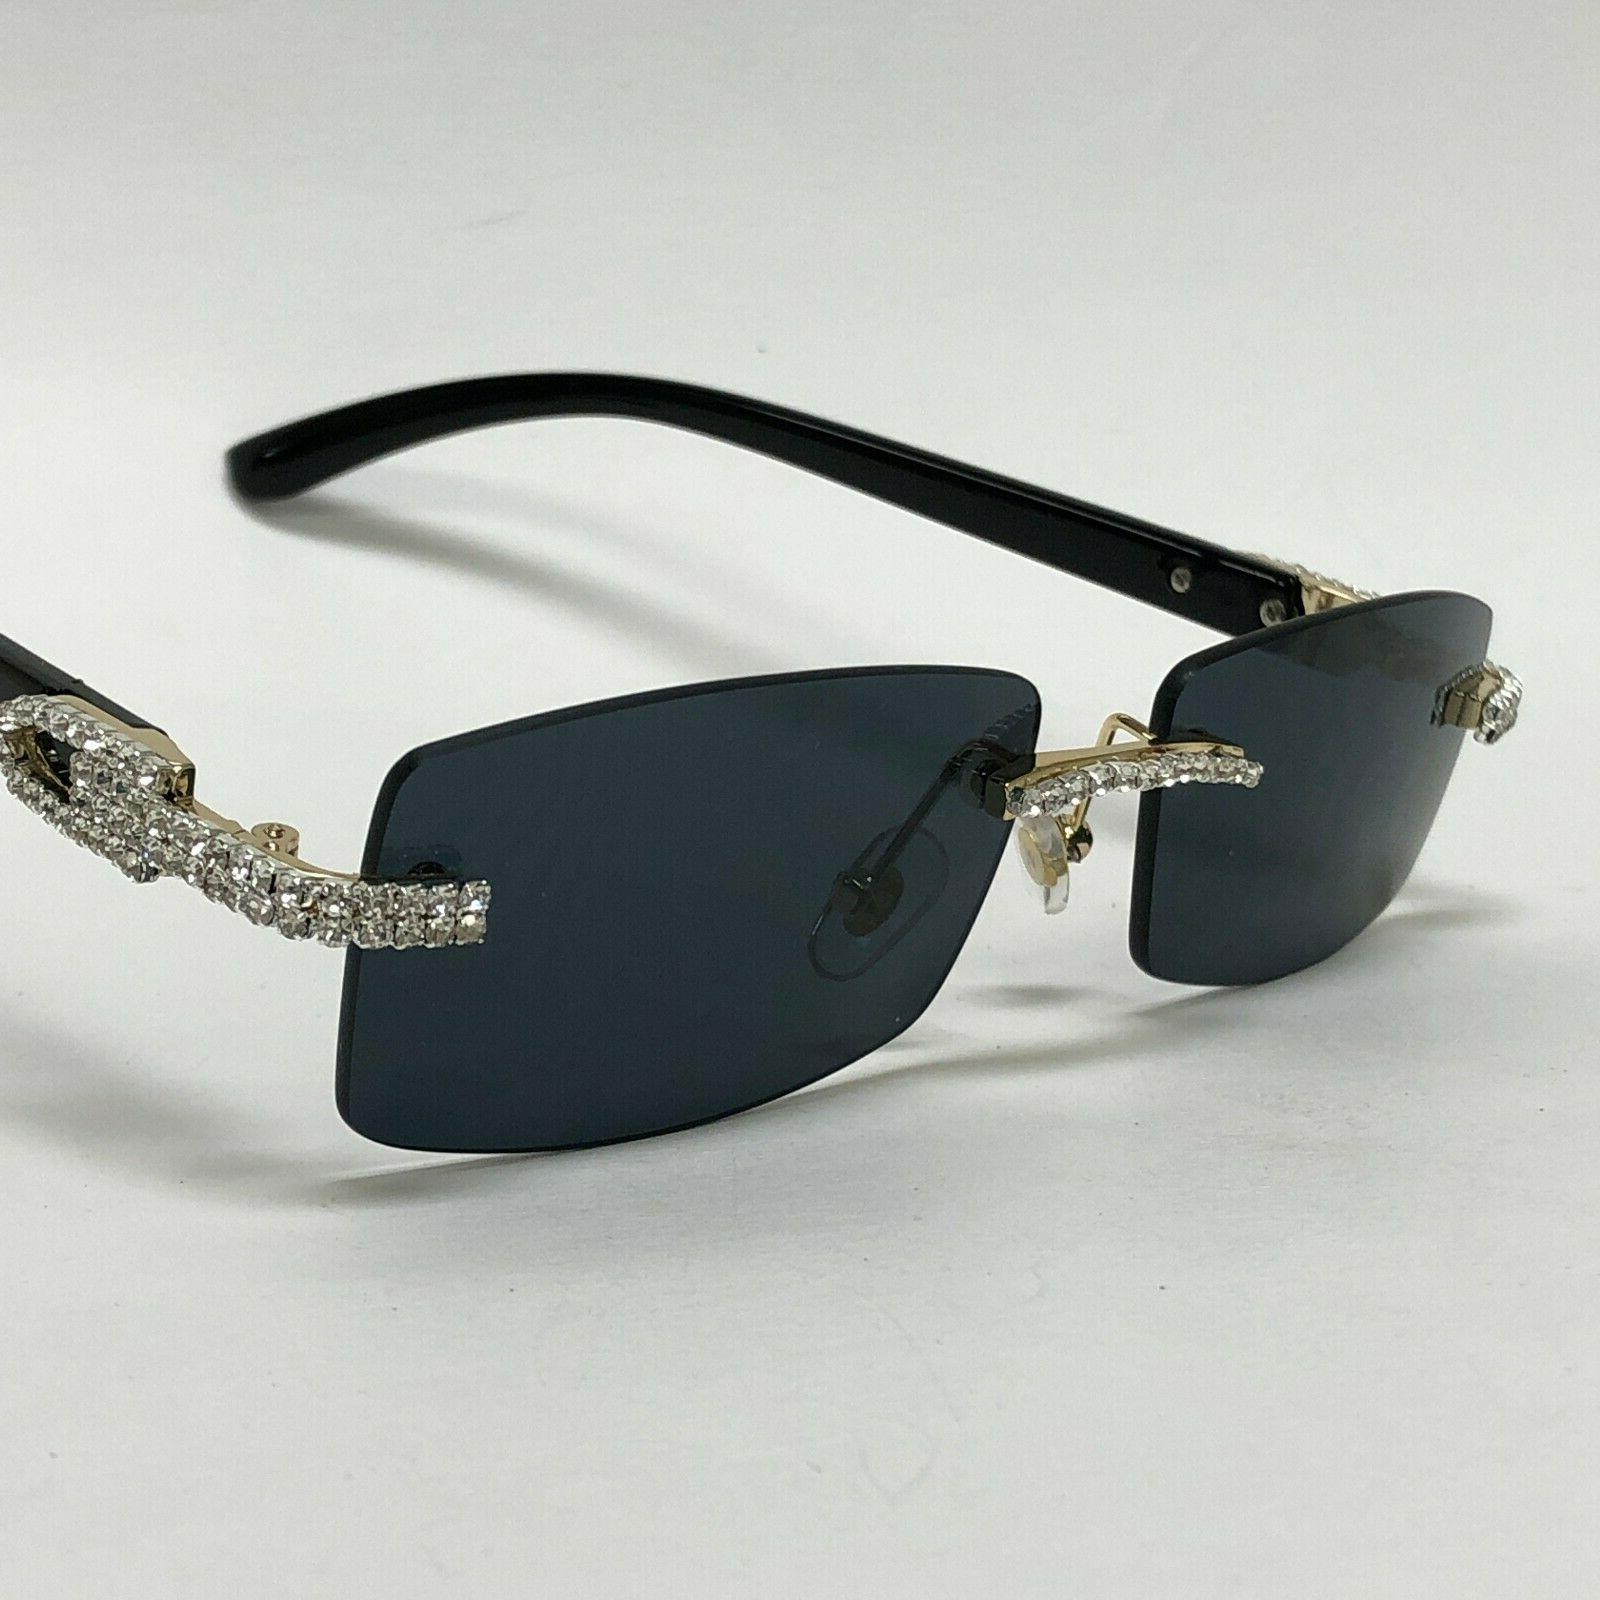 Men's Clear Eye Glasses Classy Elegant